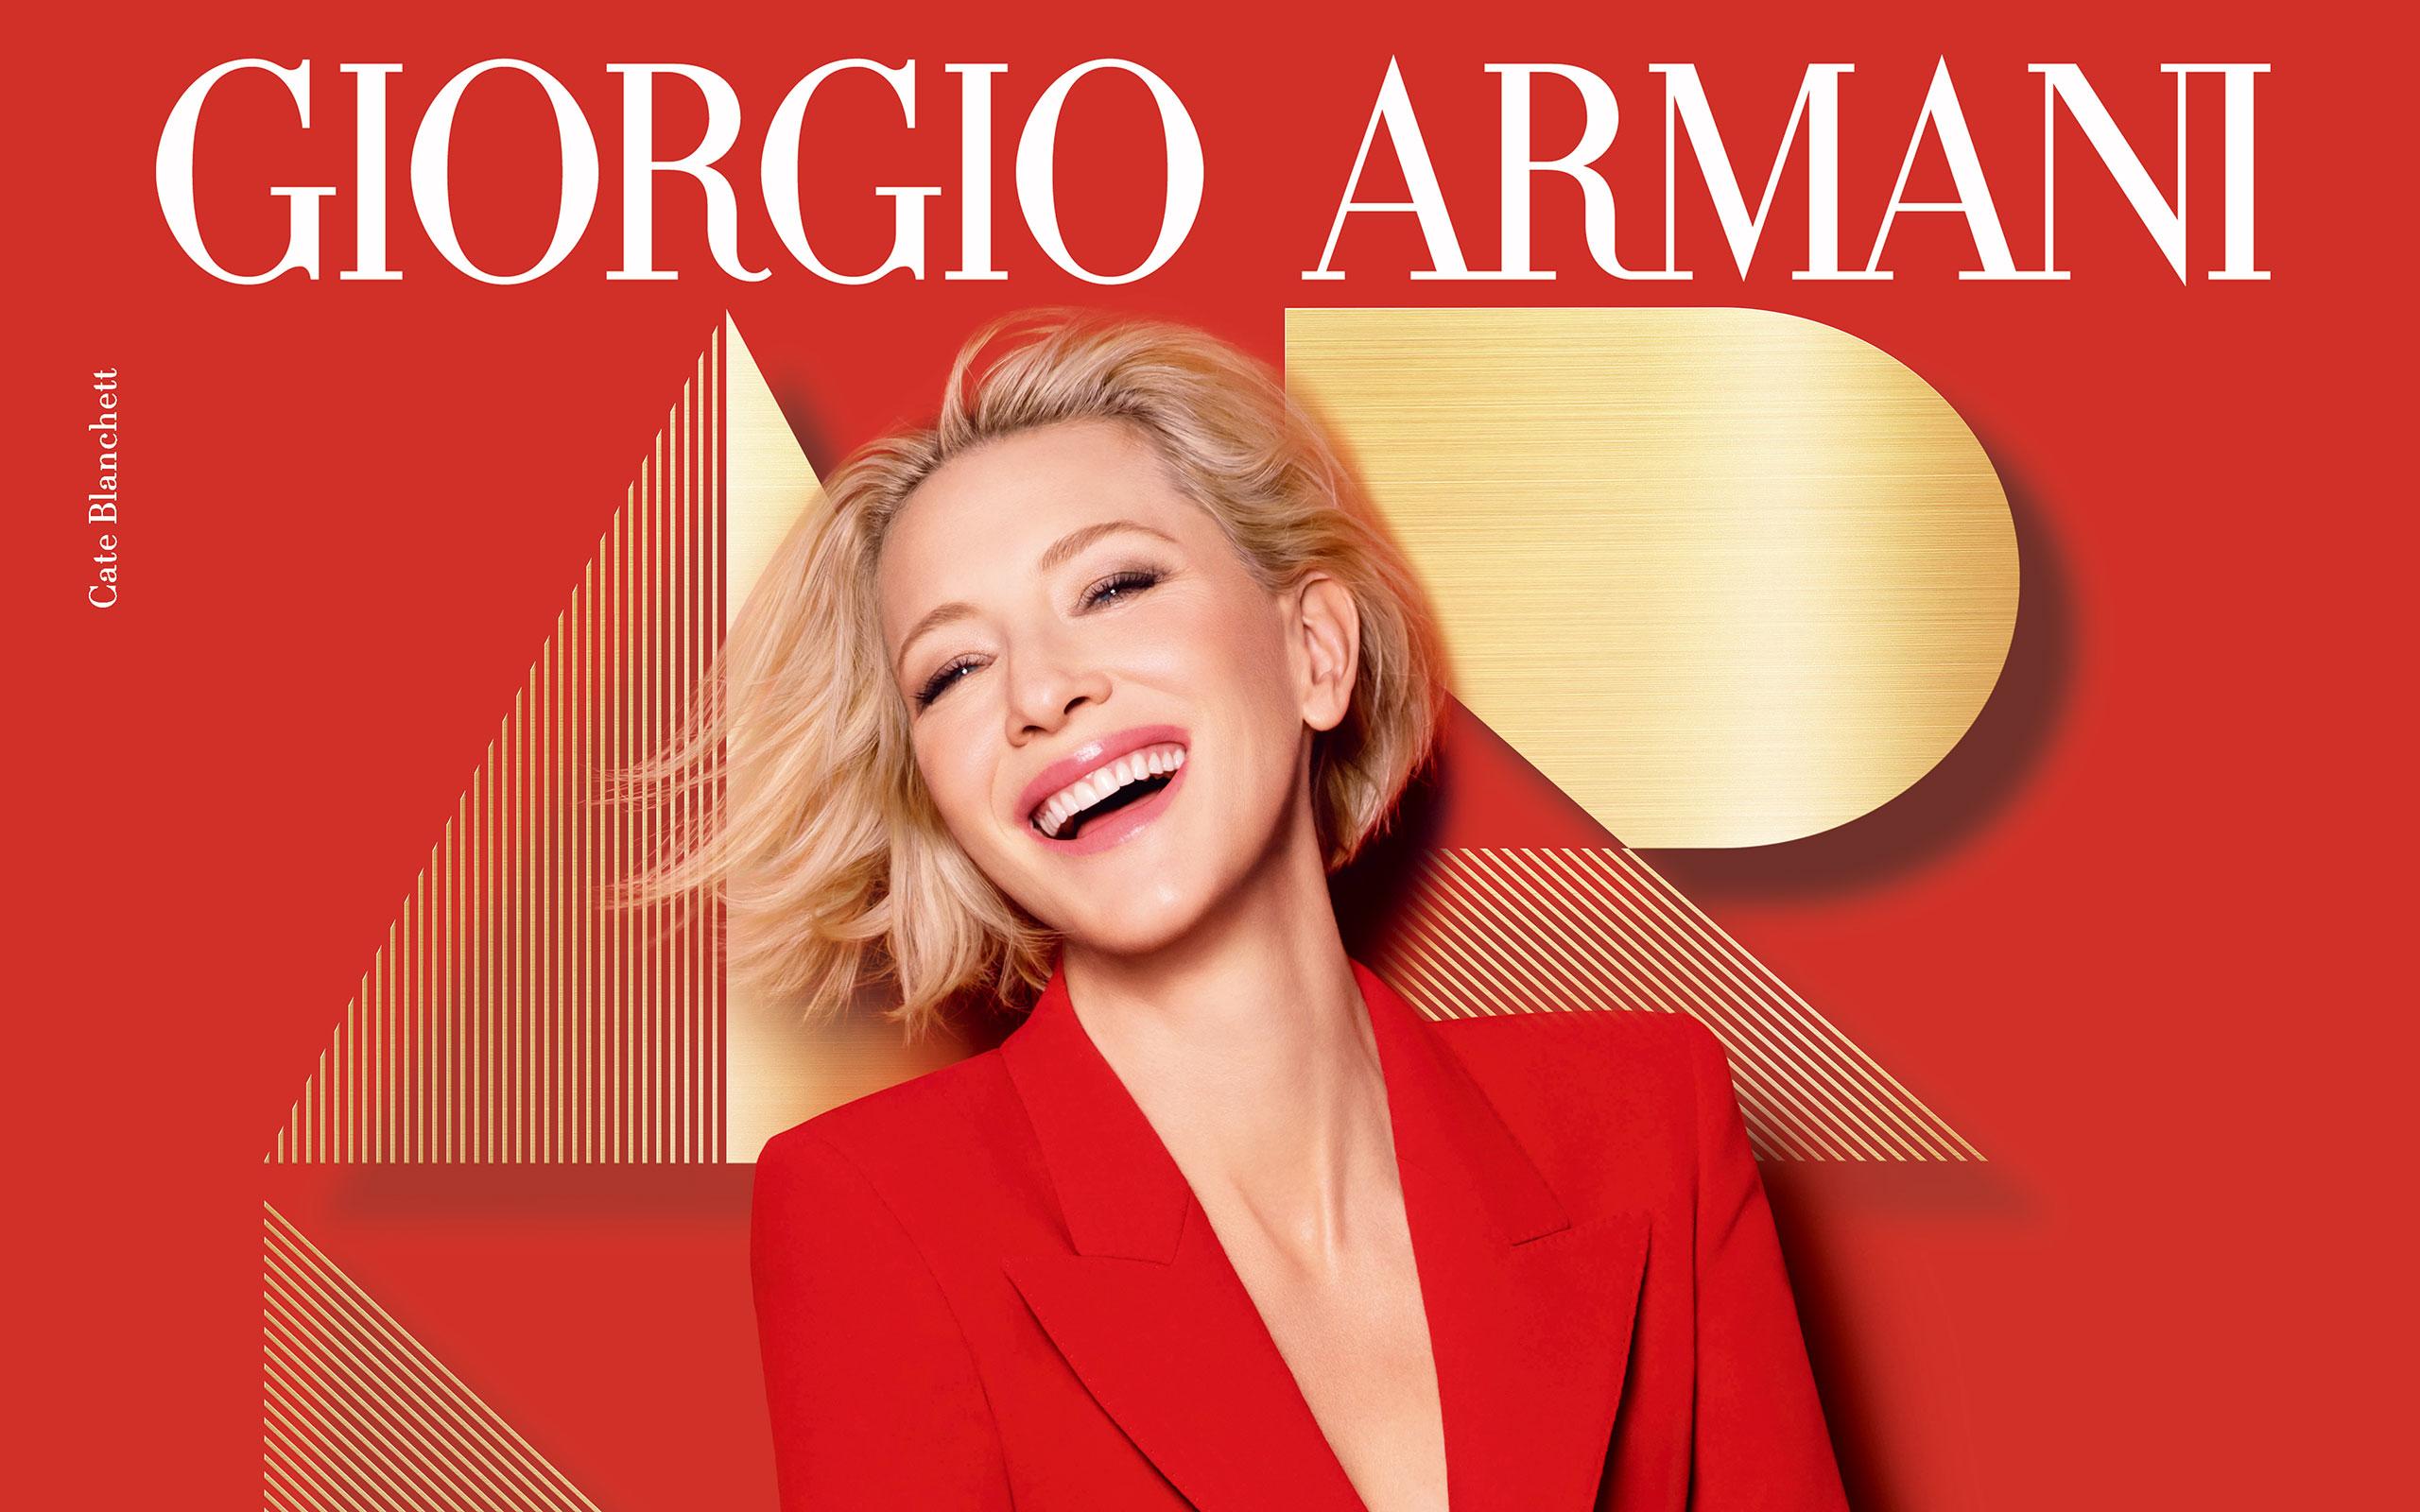 GIORGIO ARMANI beauty Introduces 2018 Holiday Collection